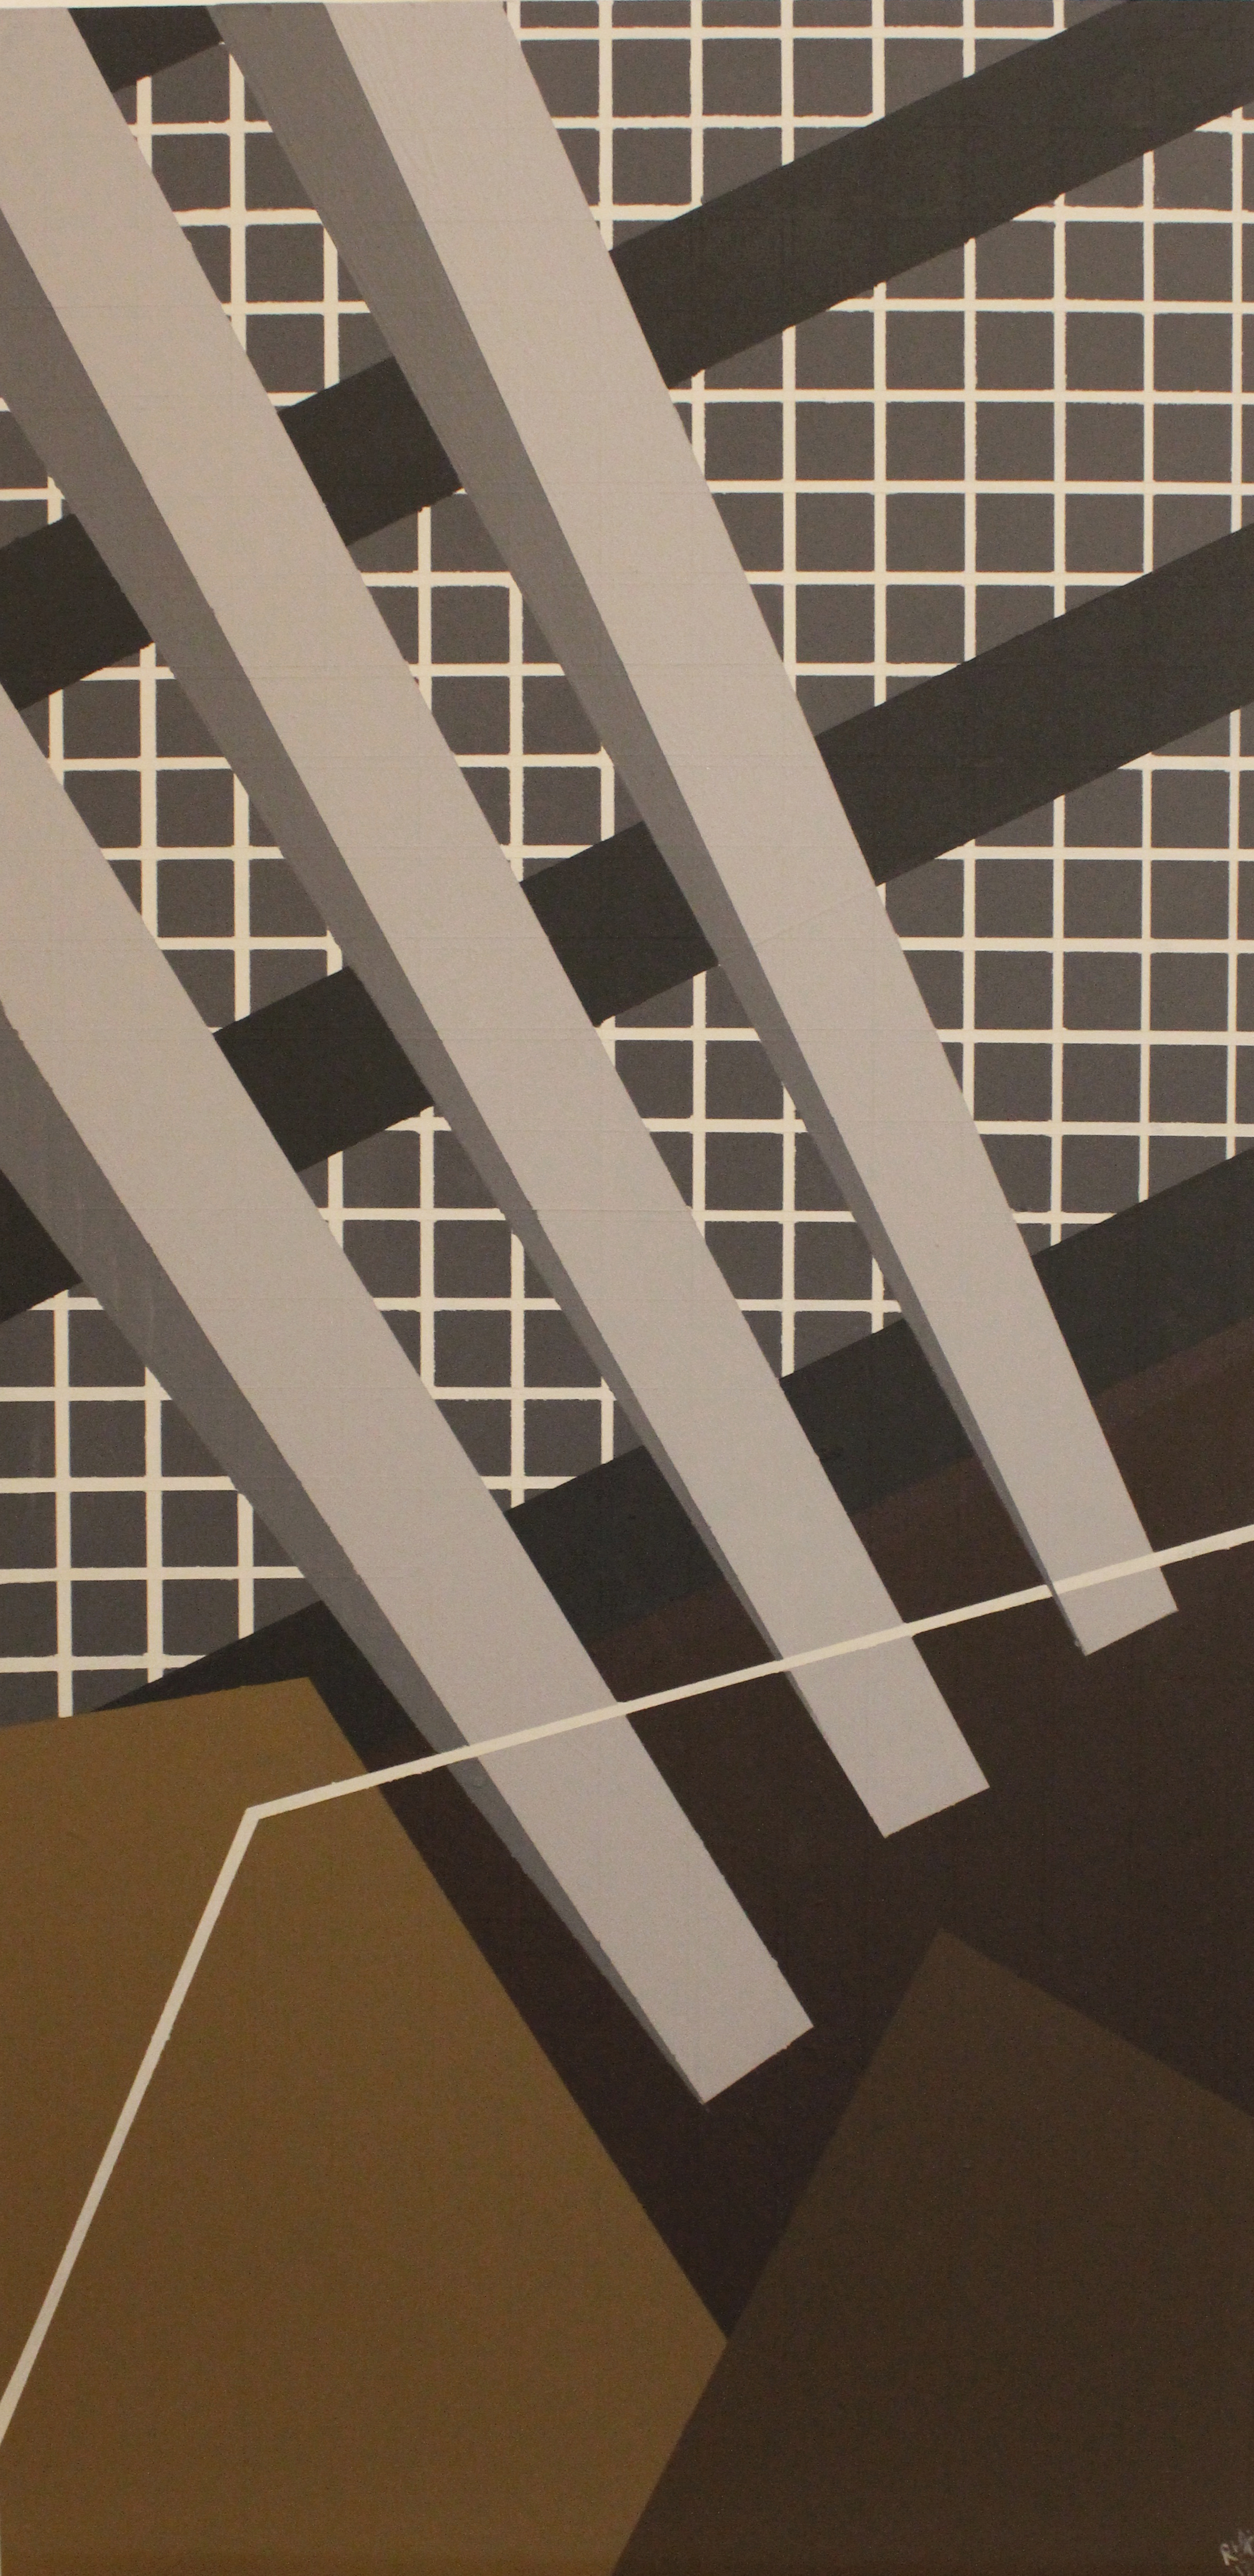 Under railway bridge (2017)